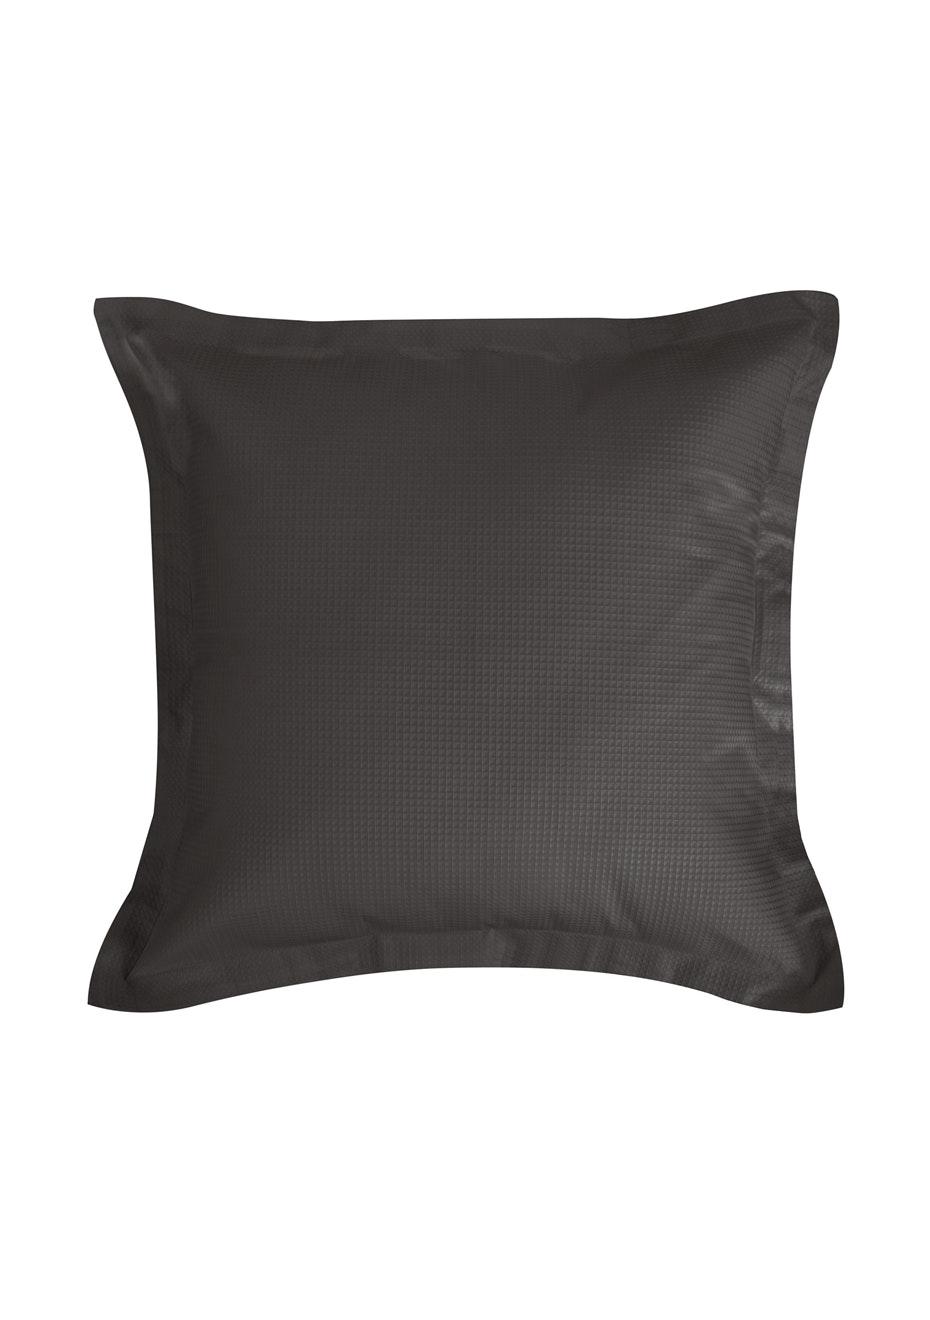 Savona - Nova Euro Pillow Case Charcoal